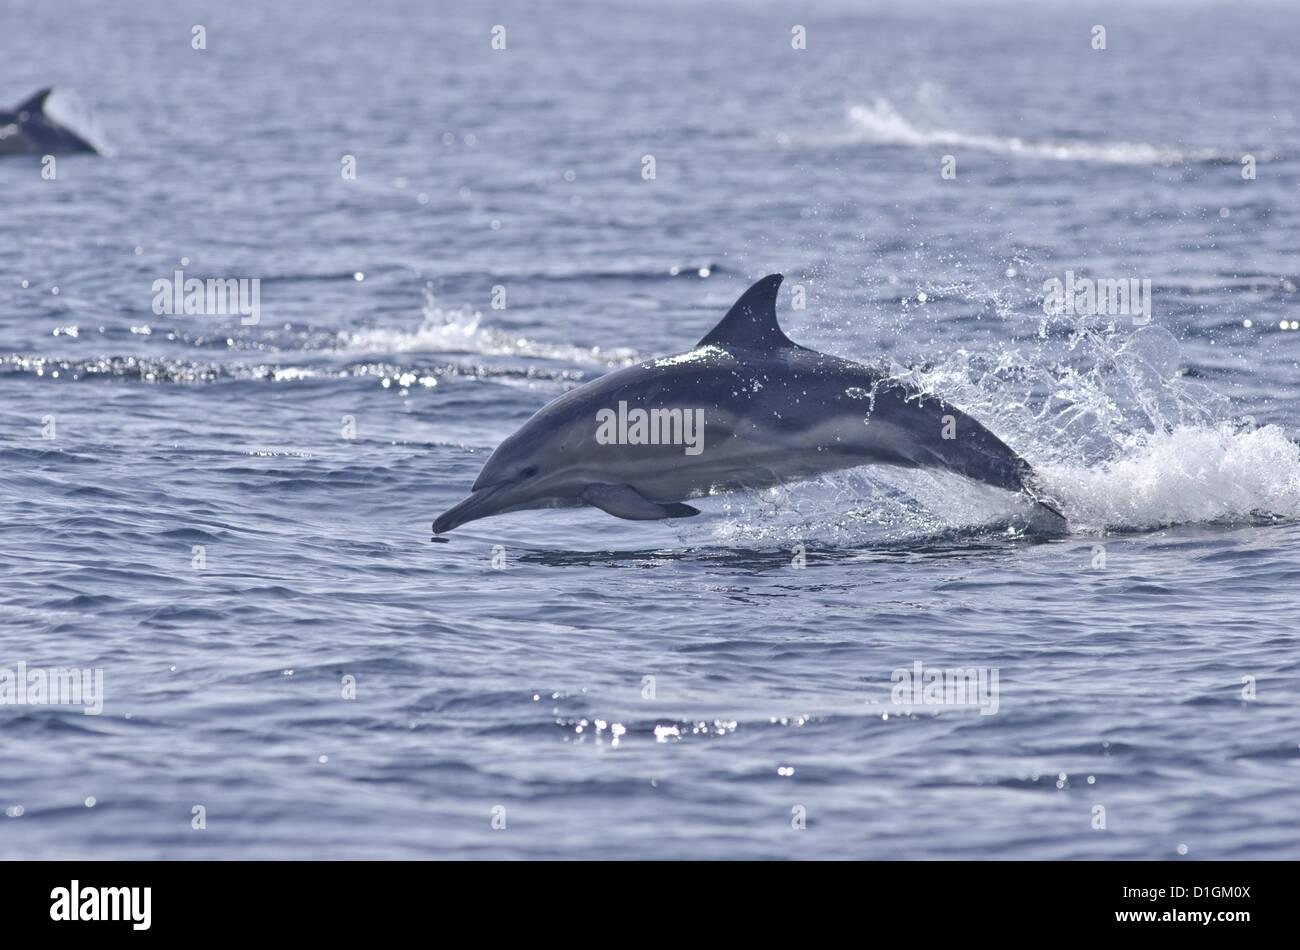 Common dolphin (Delphinus delphis), Sound of Mull, Inner Hebrides, Scotland, United Kingdom, Europe - Stock Image